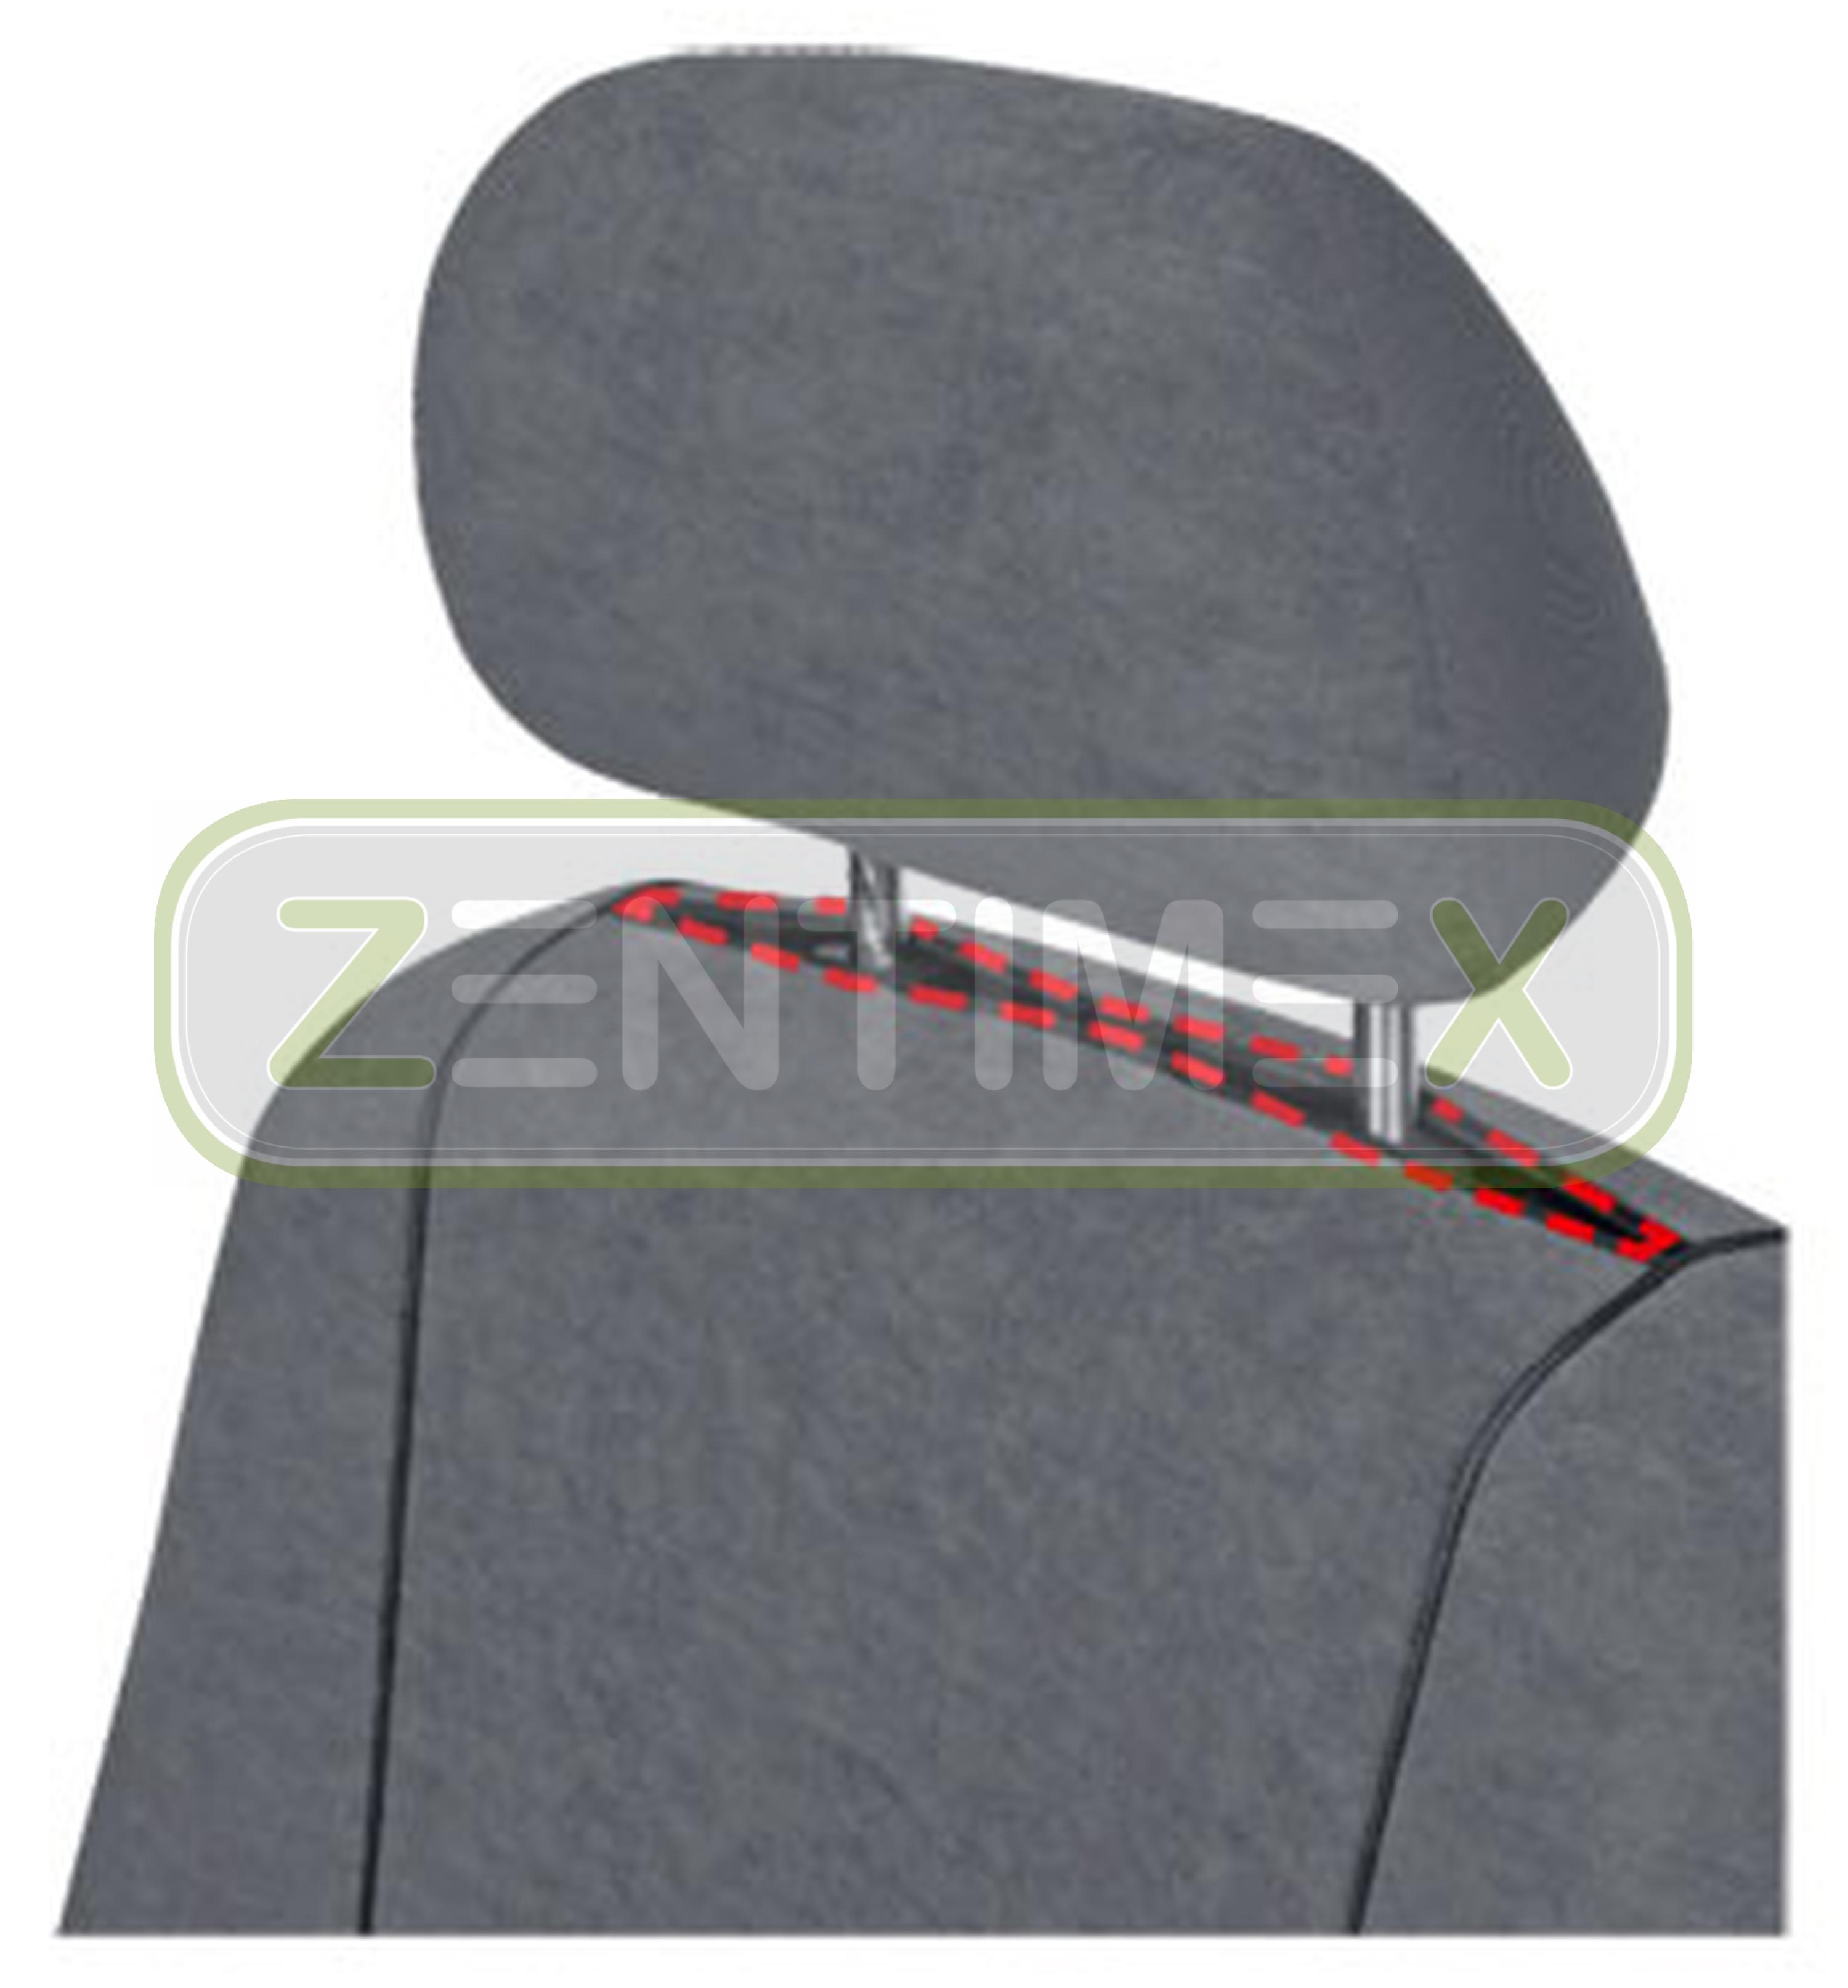 Sitzbezüge Schonbezüge SET ERR Mercedes Sprinter Stoff dunkel grau